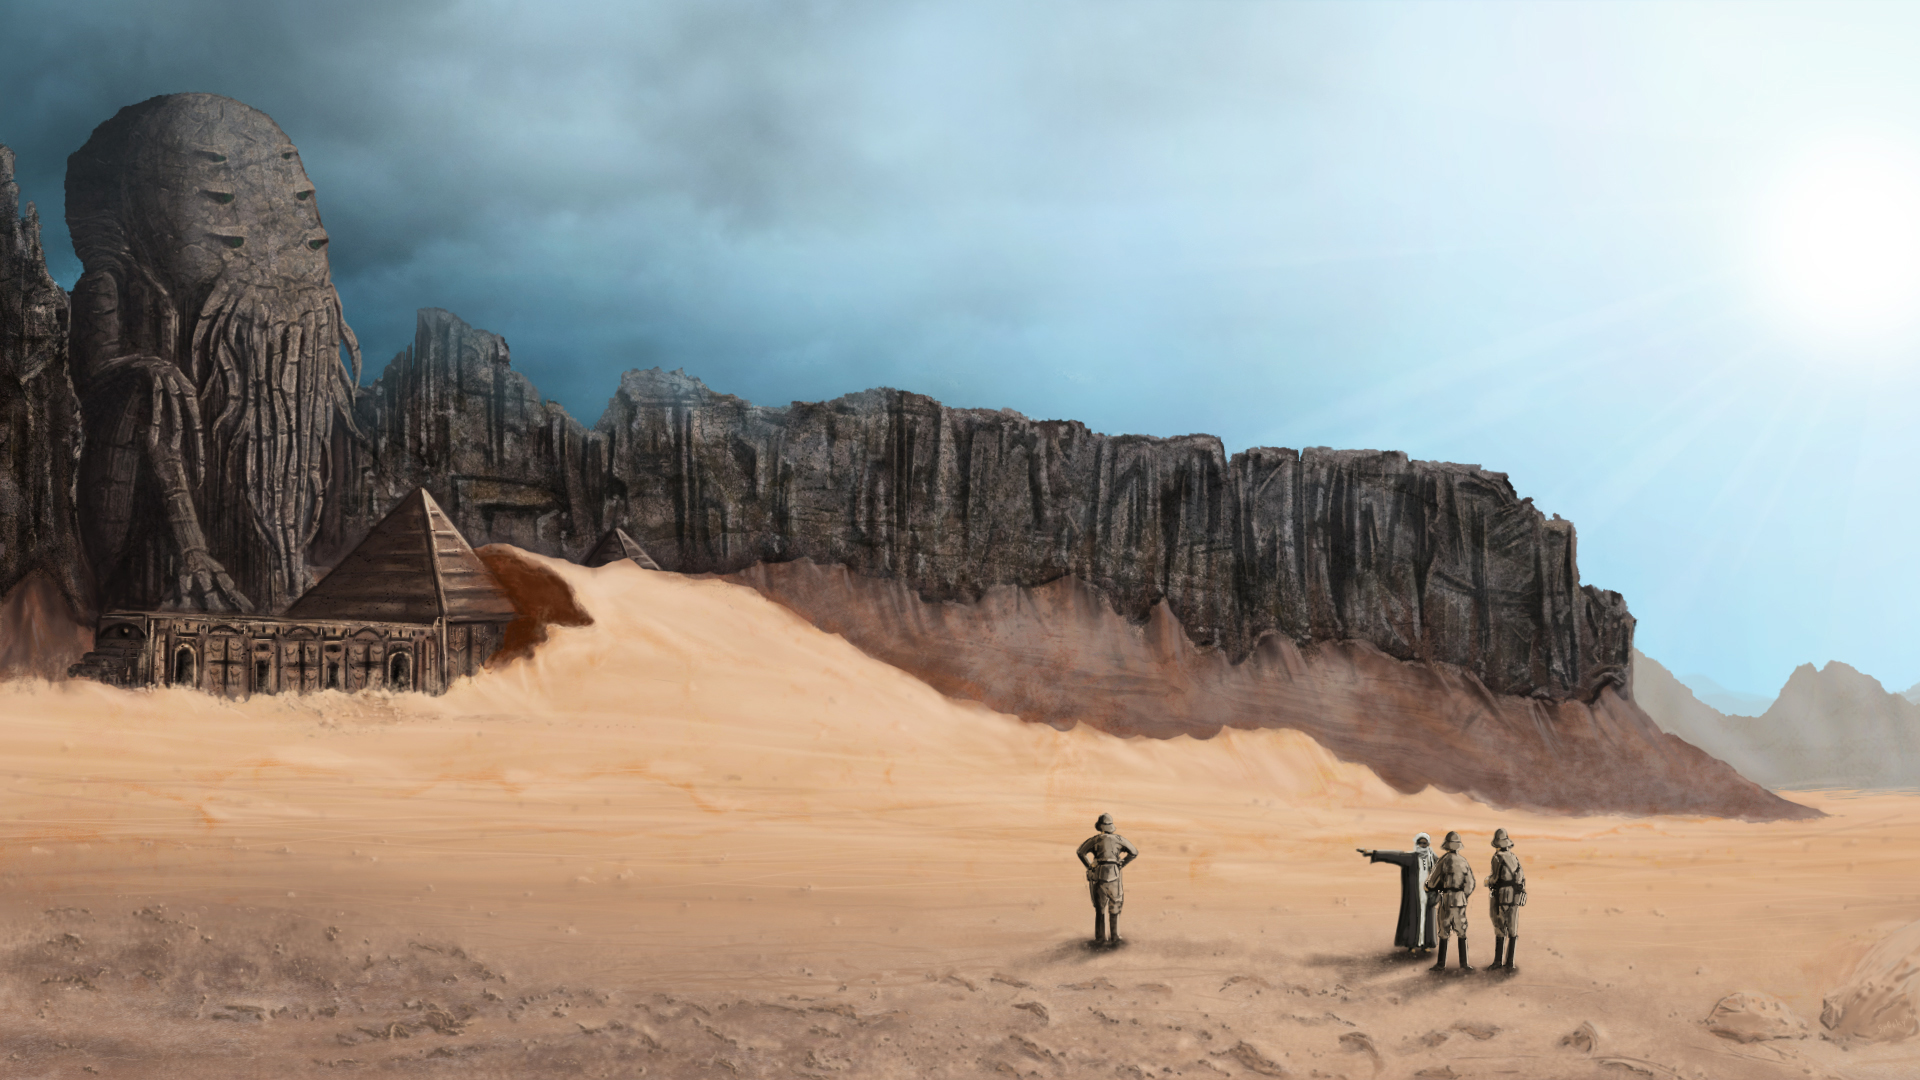 desert dreams I by SpOoKy777